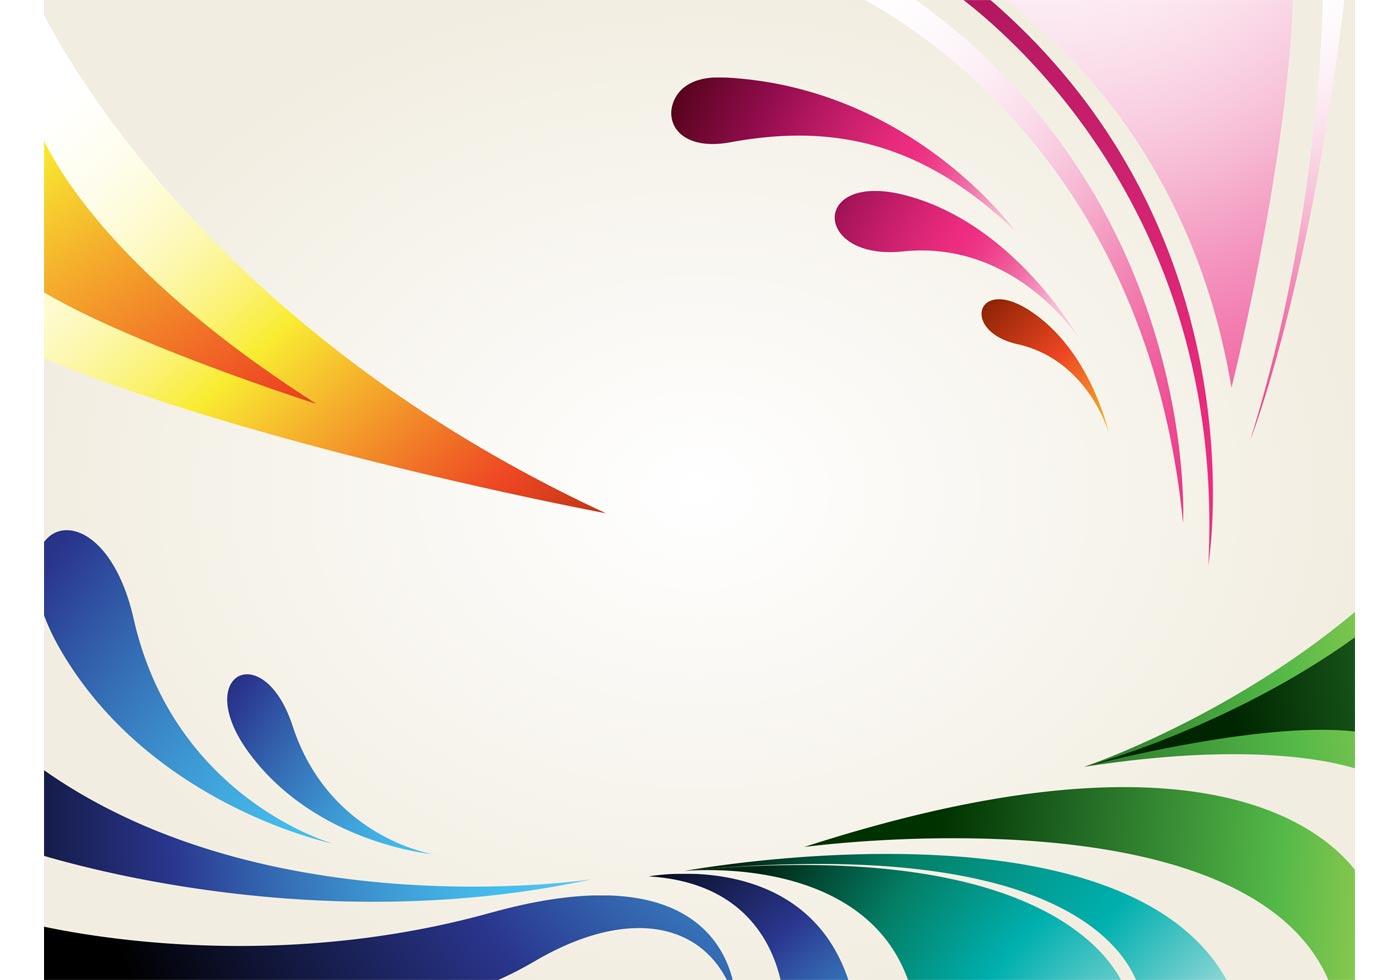 splash swoosh background image download free vector art splash vector.rar splash vector texture